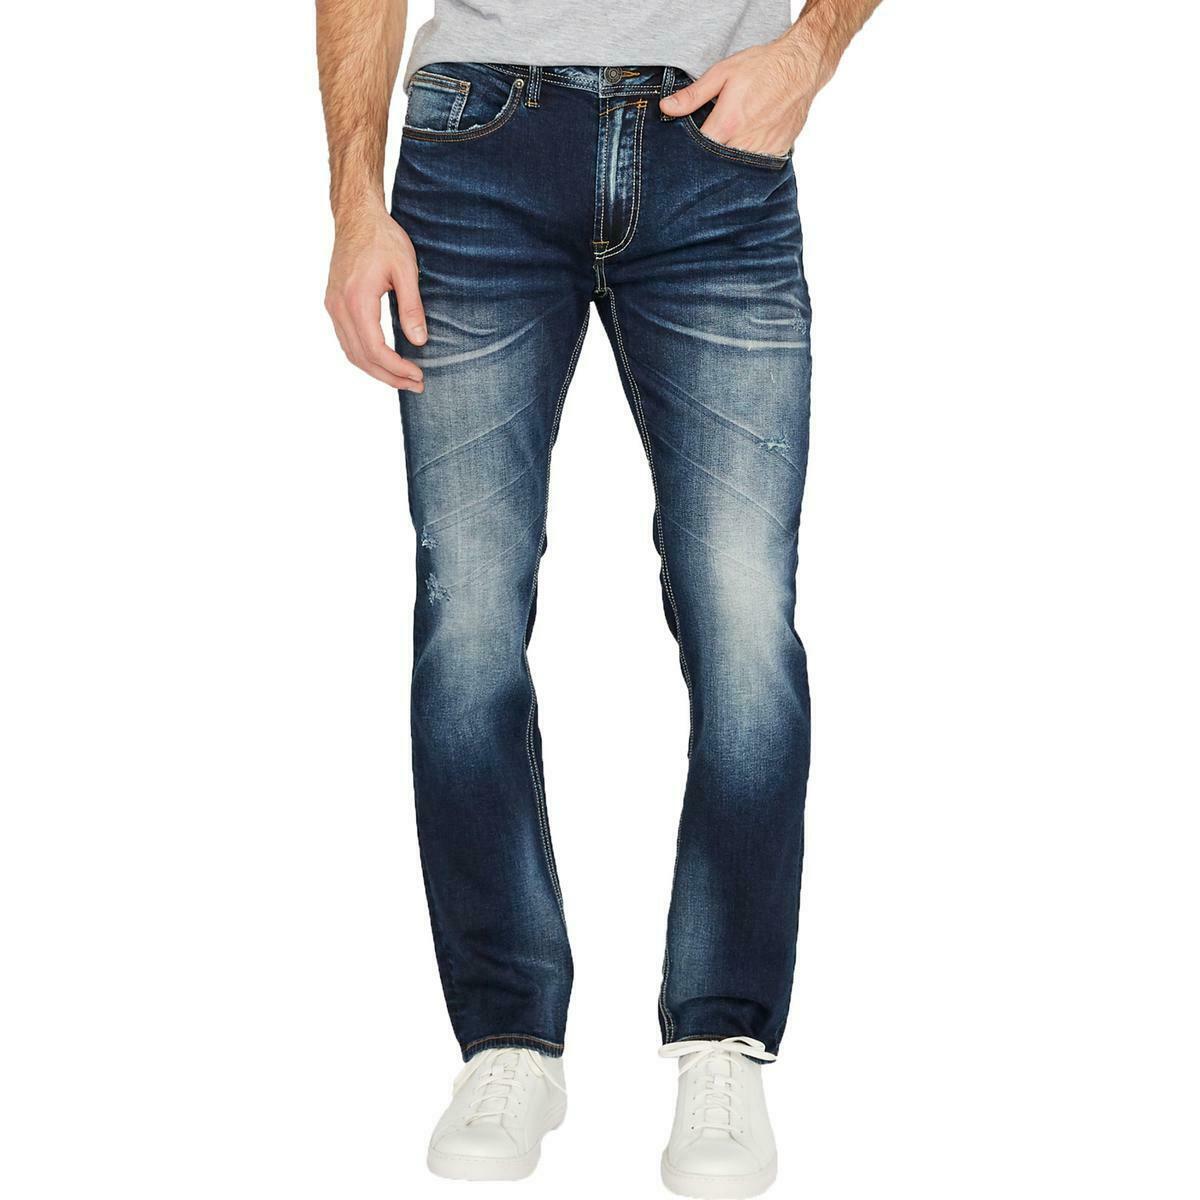 Buffalo David Bitton Mens Jeans Blue Size 38X32 Slim Ash Stretch